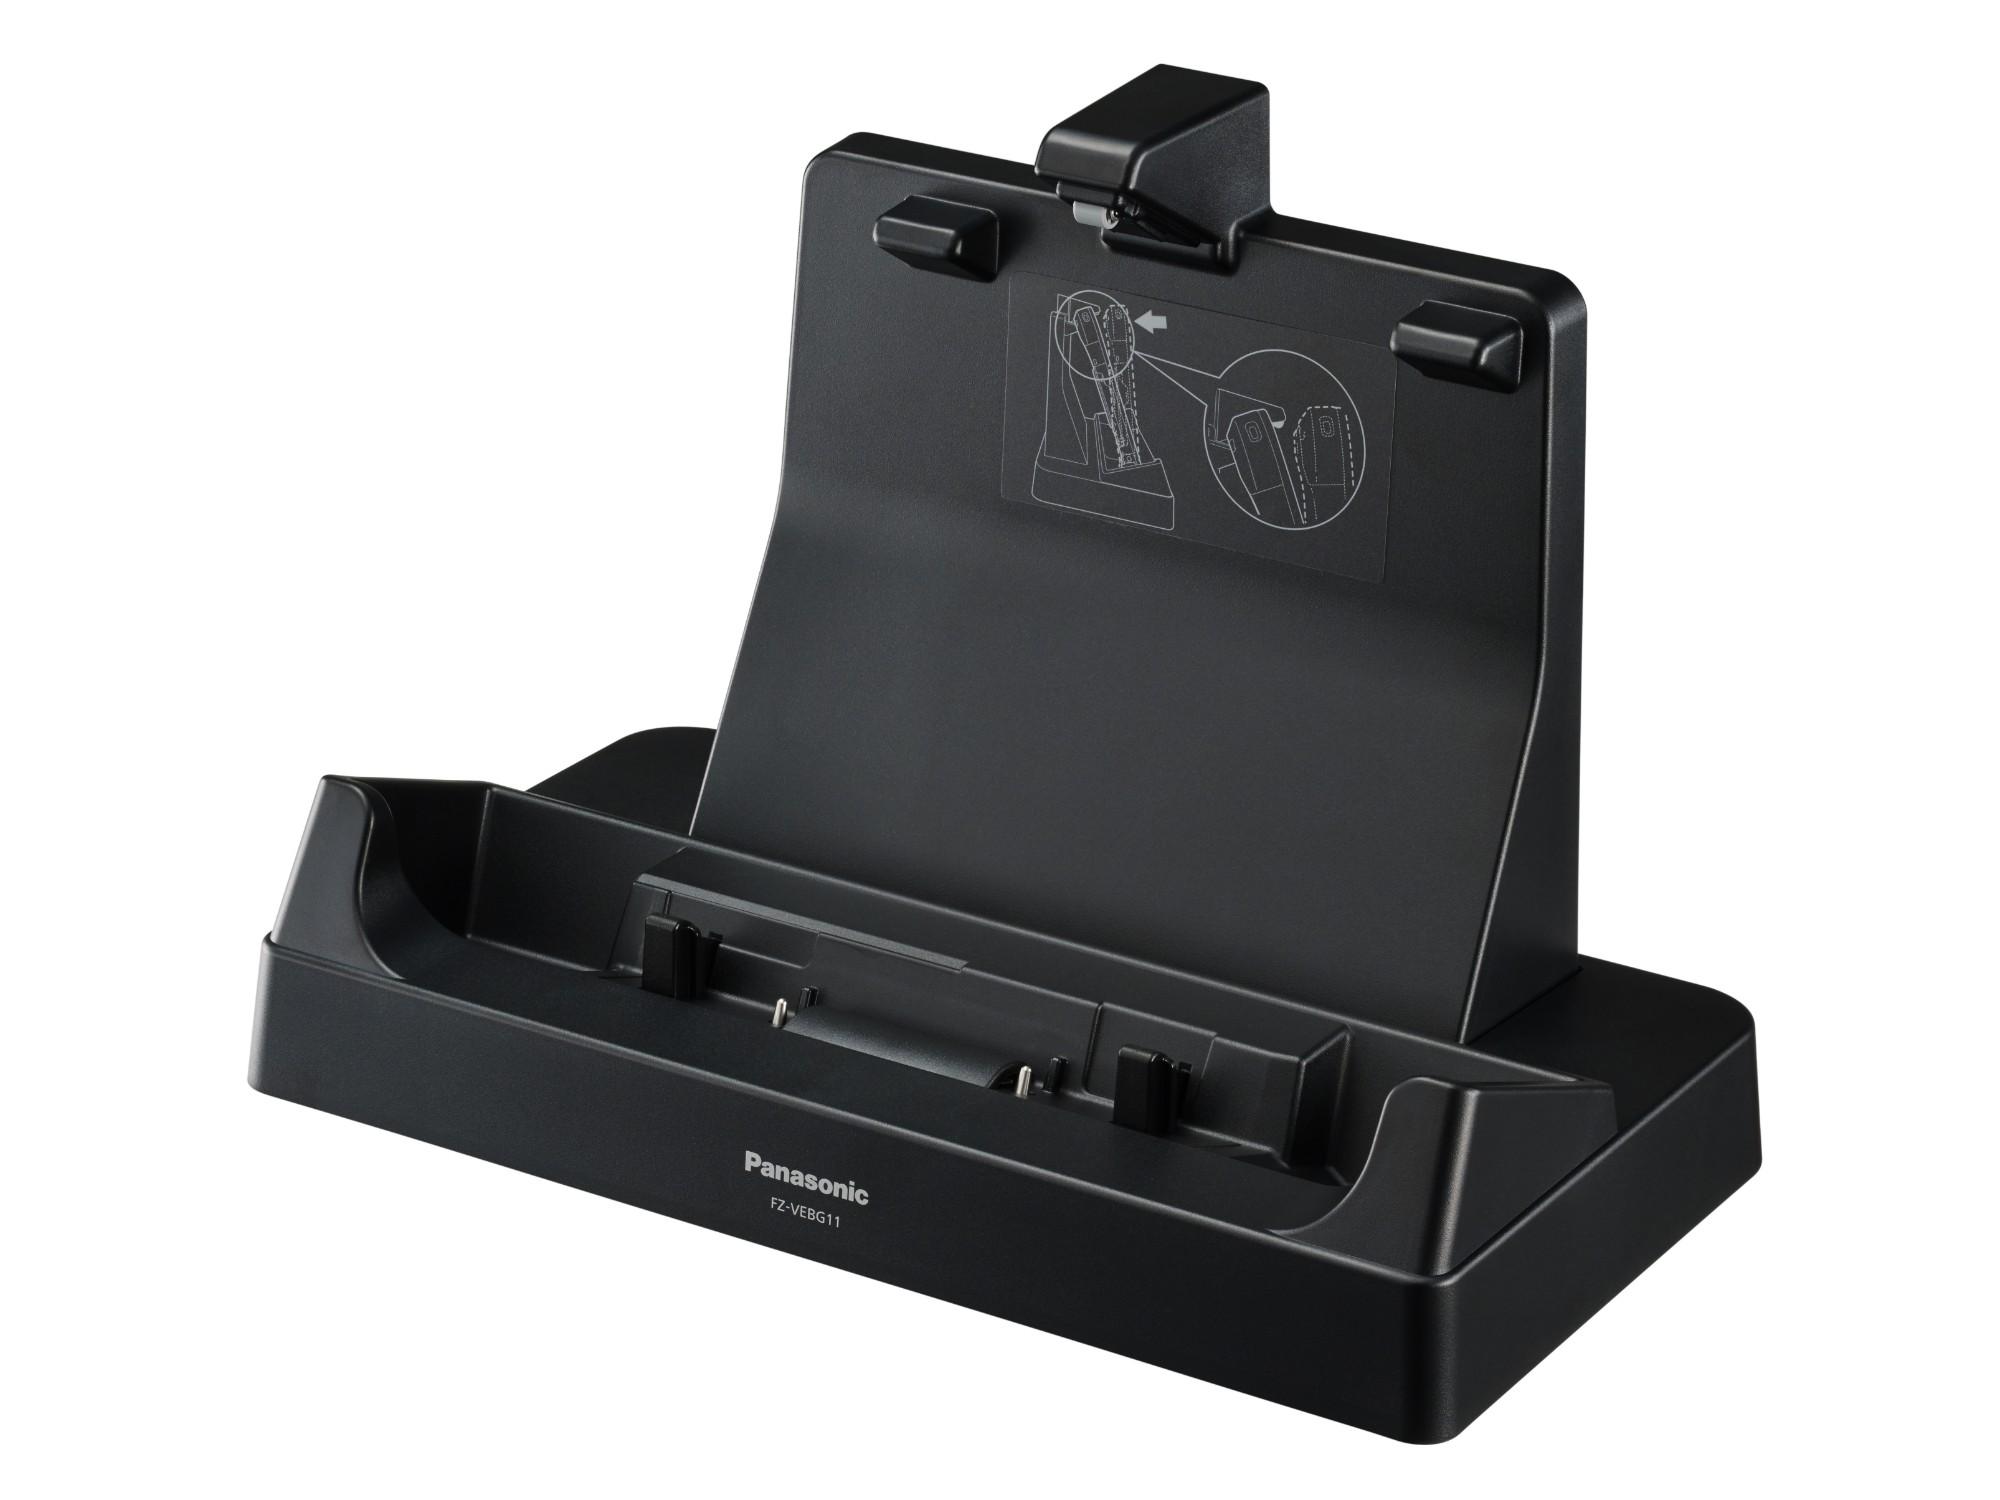 Panasonic FZ-VEBG11AU notebook dock/port replicator Docking Black